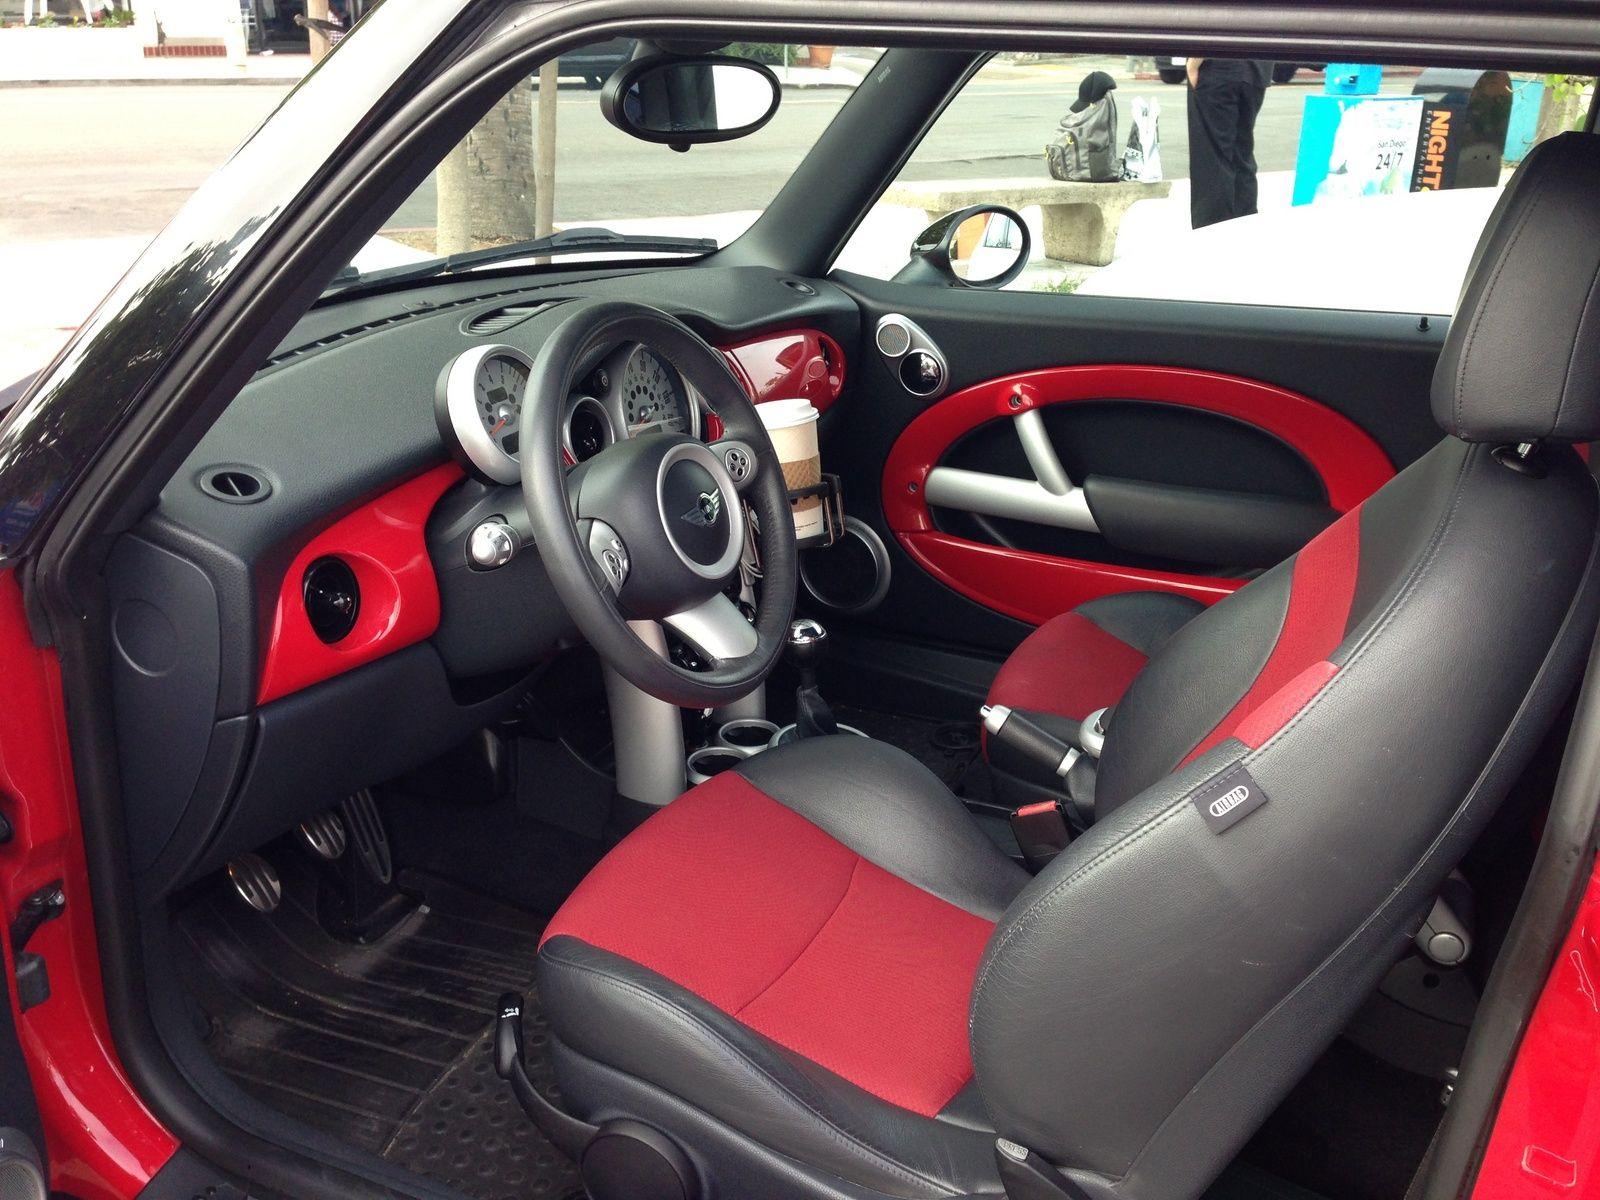 R53 Jcw Red Interior Trim Four Wheels Good Mini Cooper S 2006